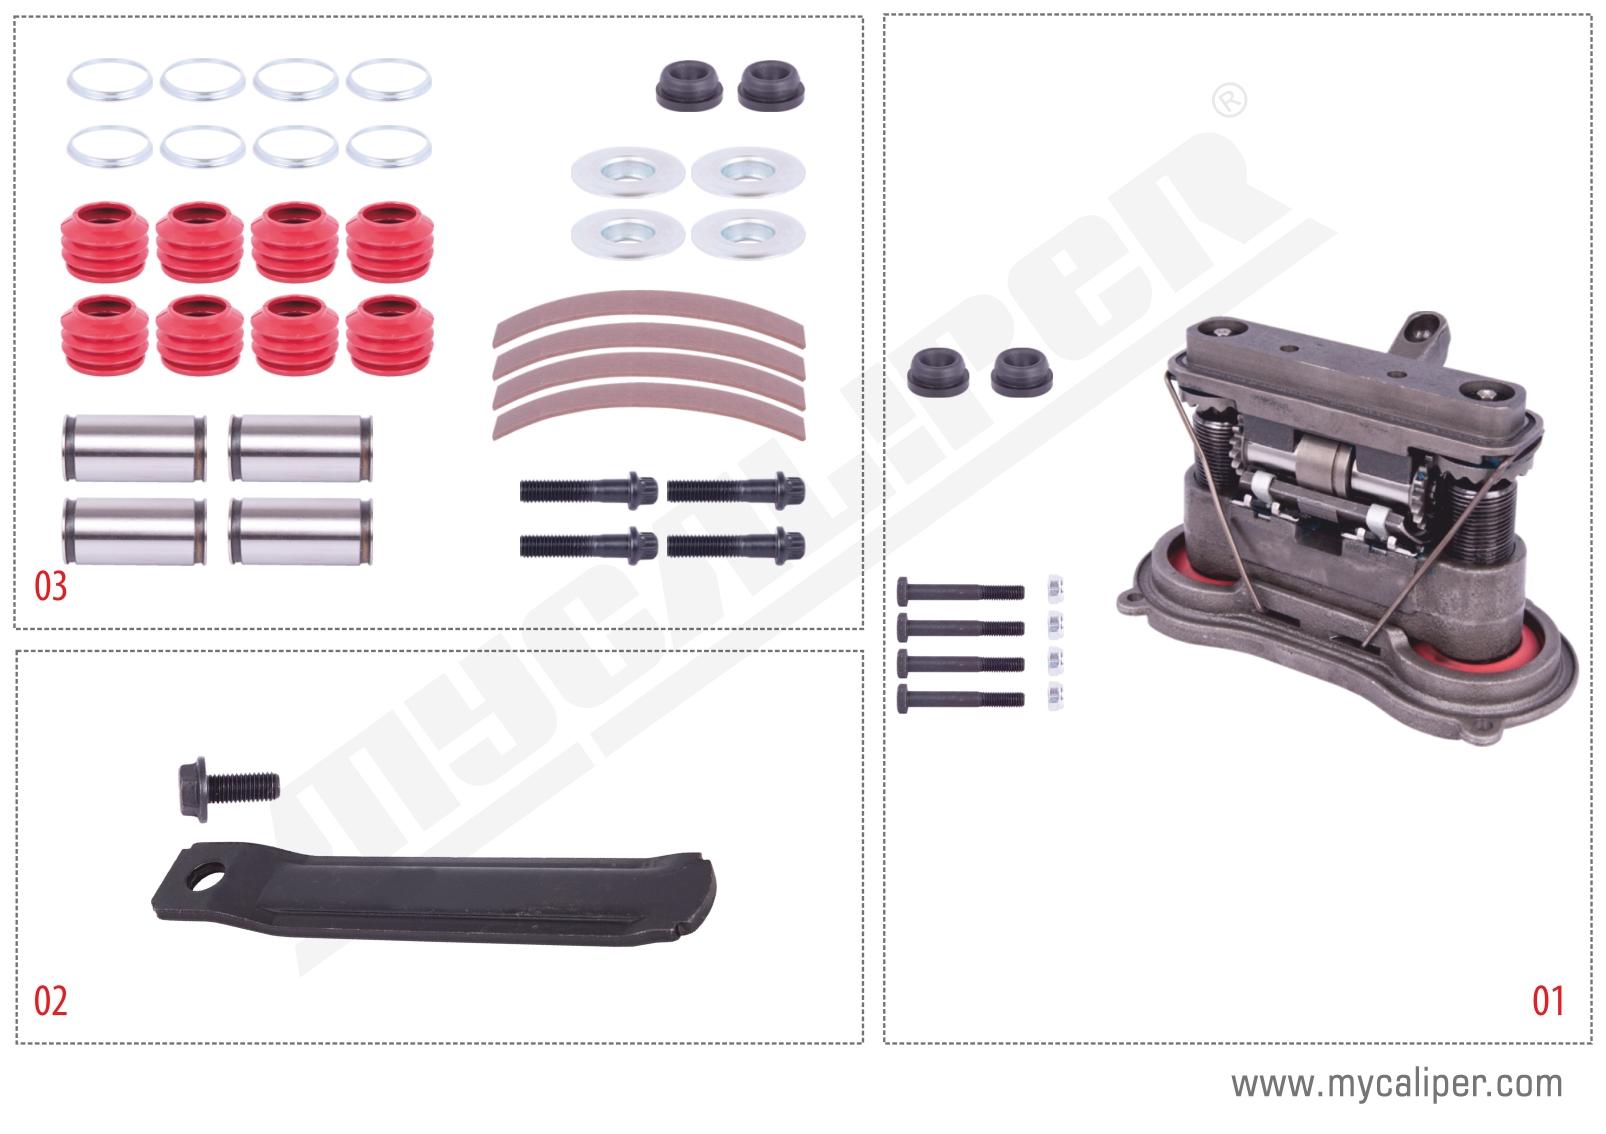 MARK II-III (2-3) TYPE Piston Version Repair Set